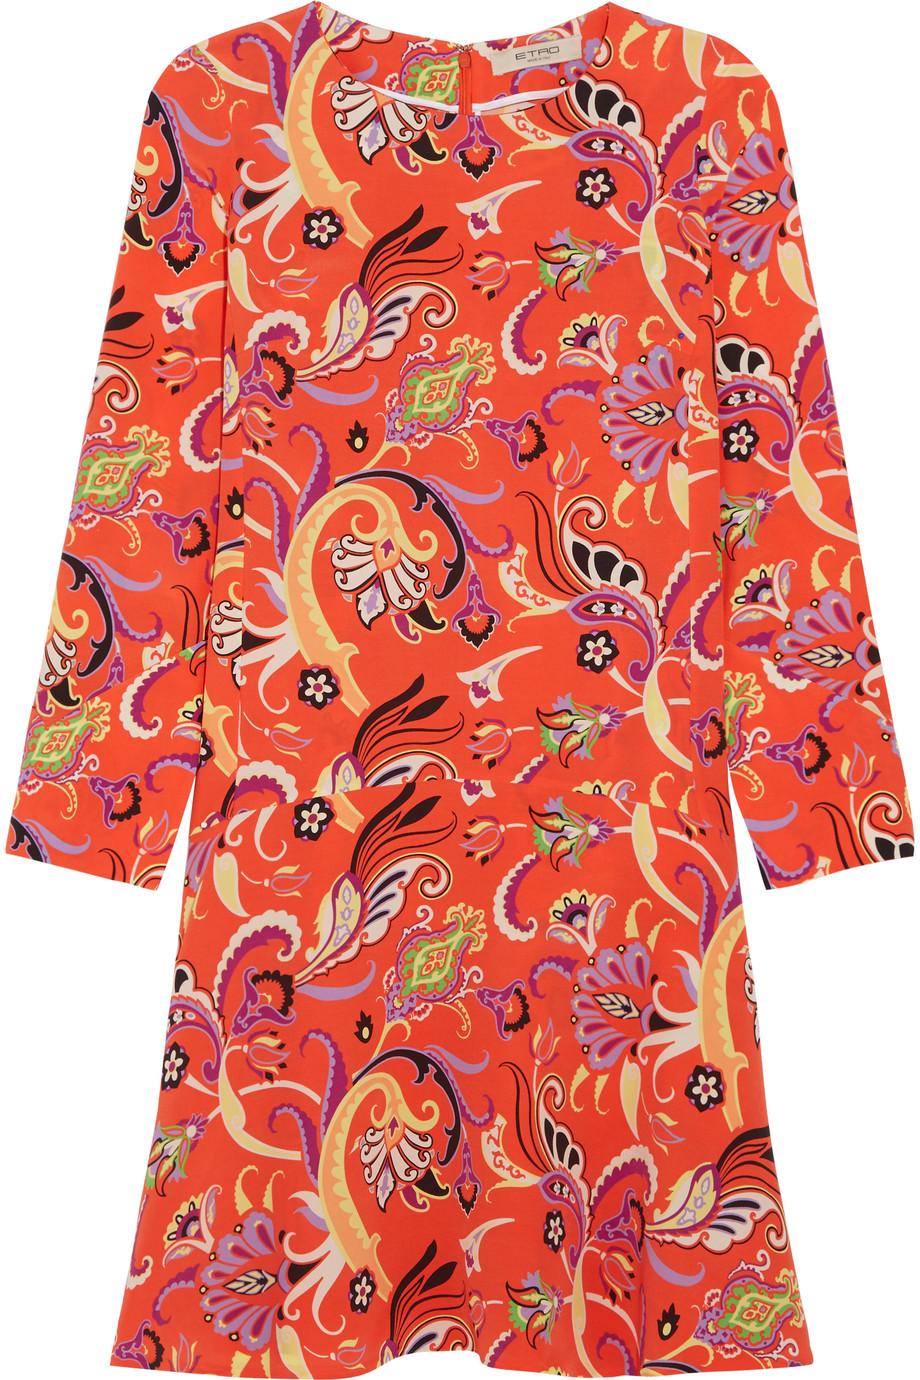 Etro Printed Silk Crepe De Chine Dress, Orange, Women's - Printed, Size: 48